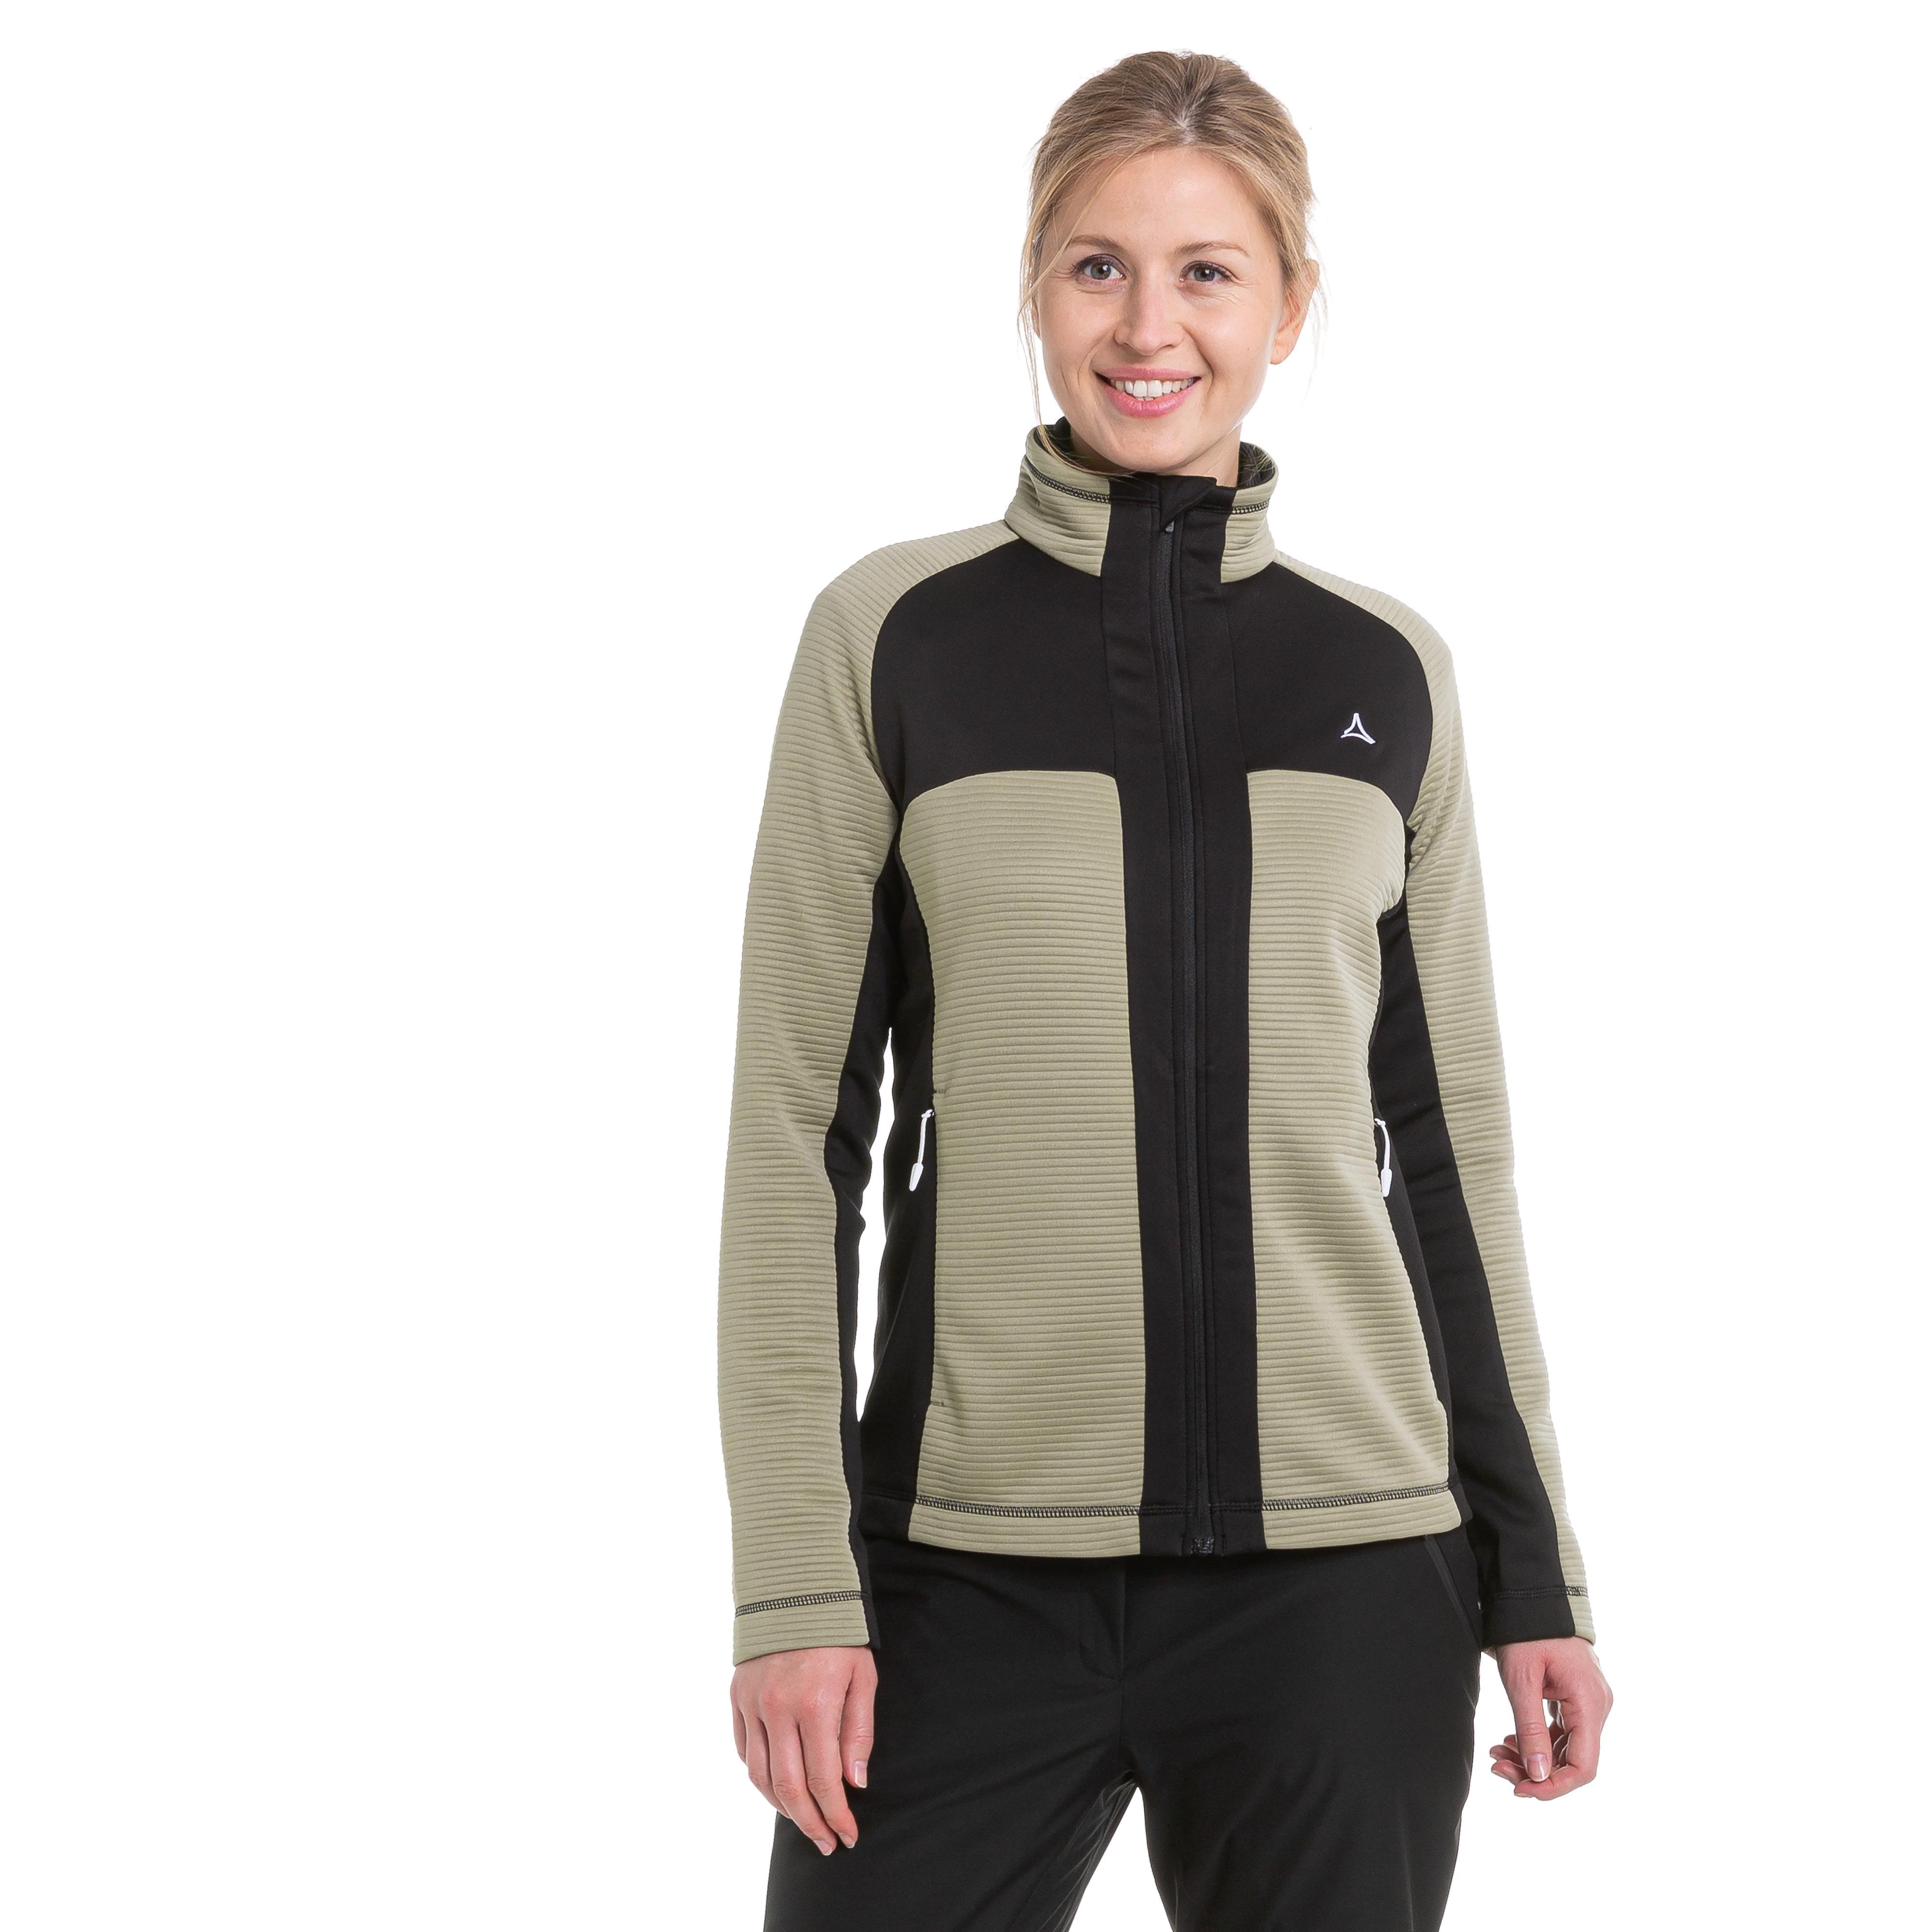 SCHÖFFEL Fleece Jacket Filzmoos L